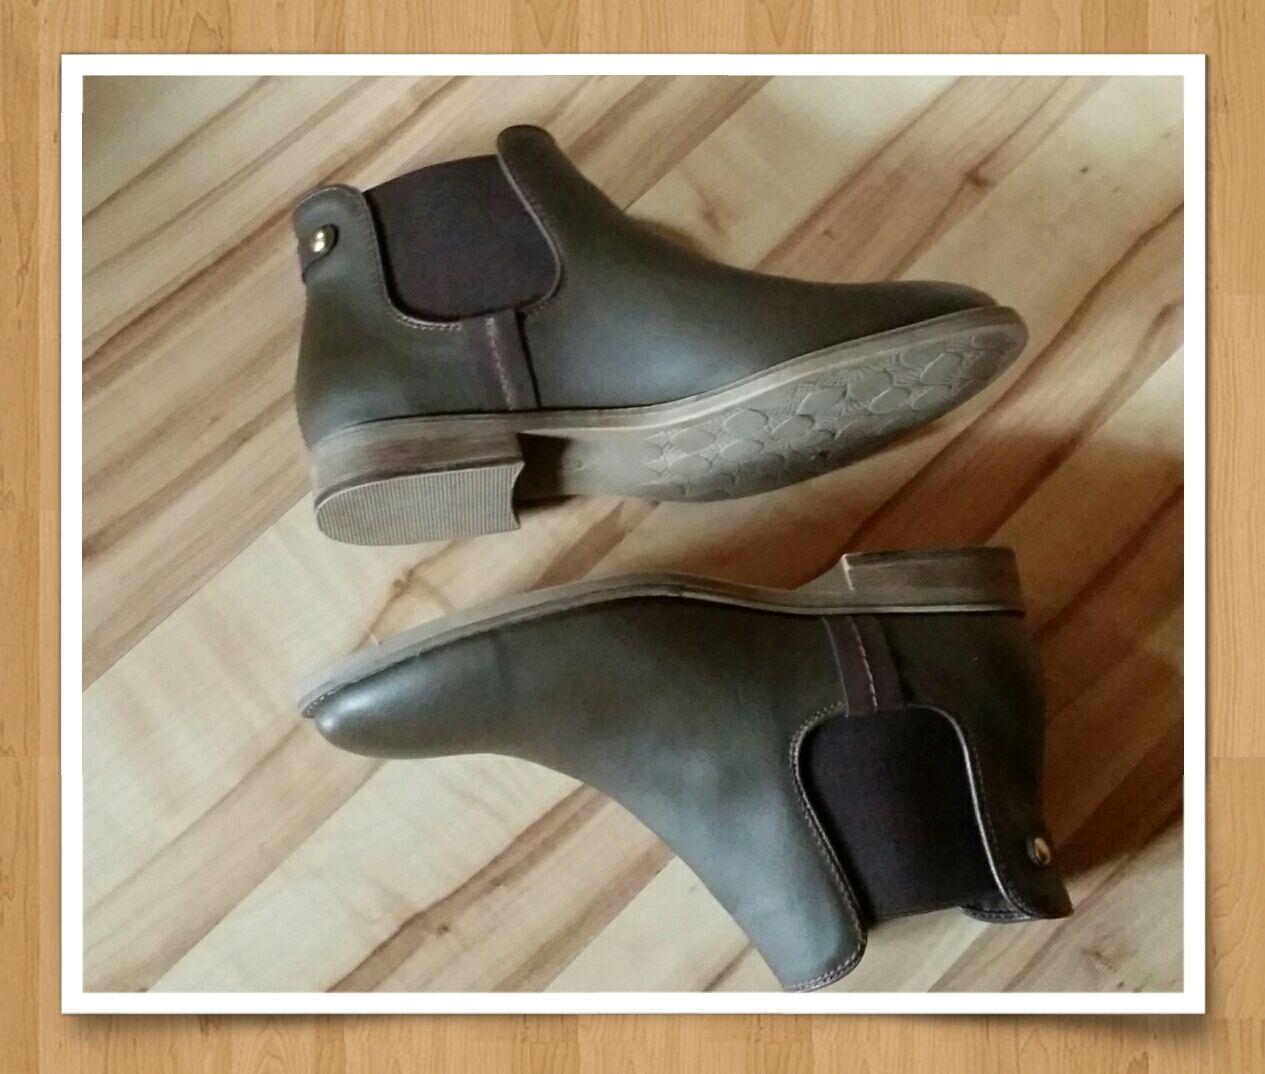 50% Sale At Deichmann | Boots, Shoes